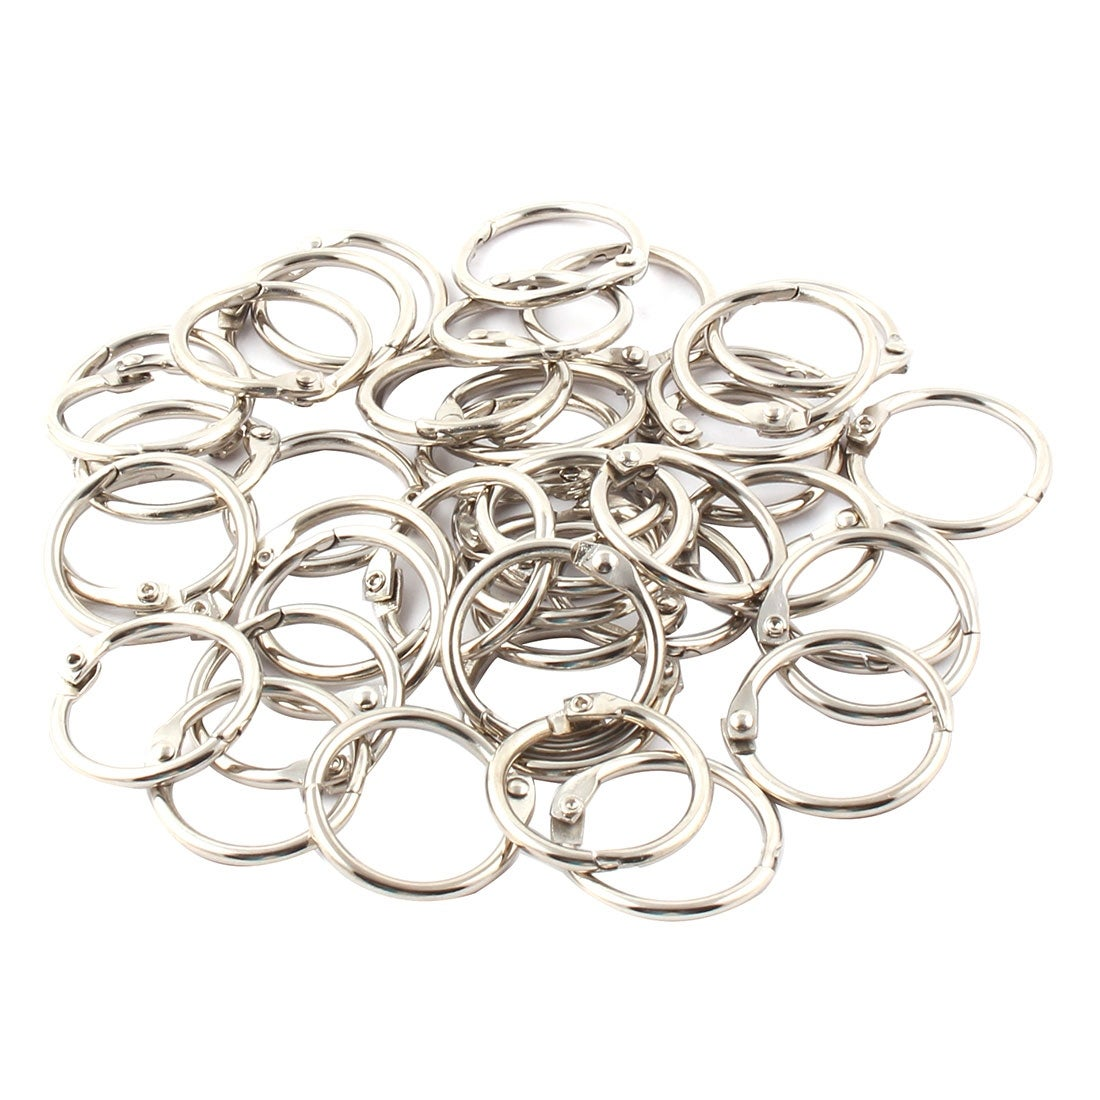 Shop Unique Bargainshandbag Wallet Free Diy Keyring Key Chain Split Loop Holder 26mm Inner Dia 43pcs Overstock 18450492